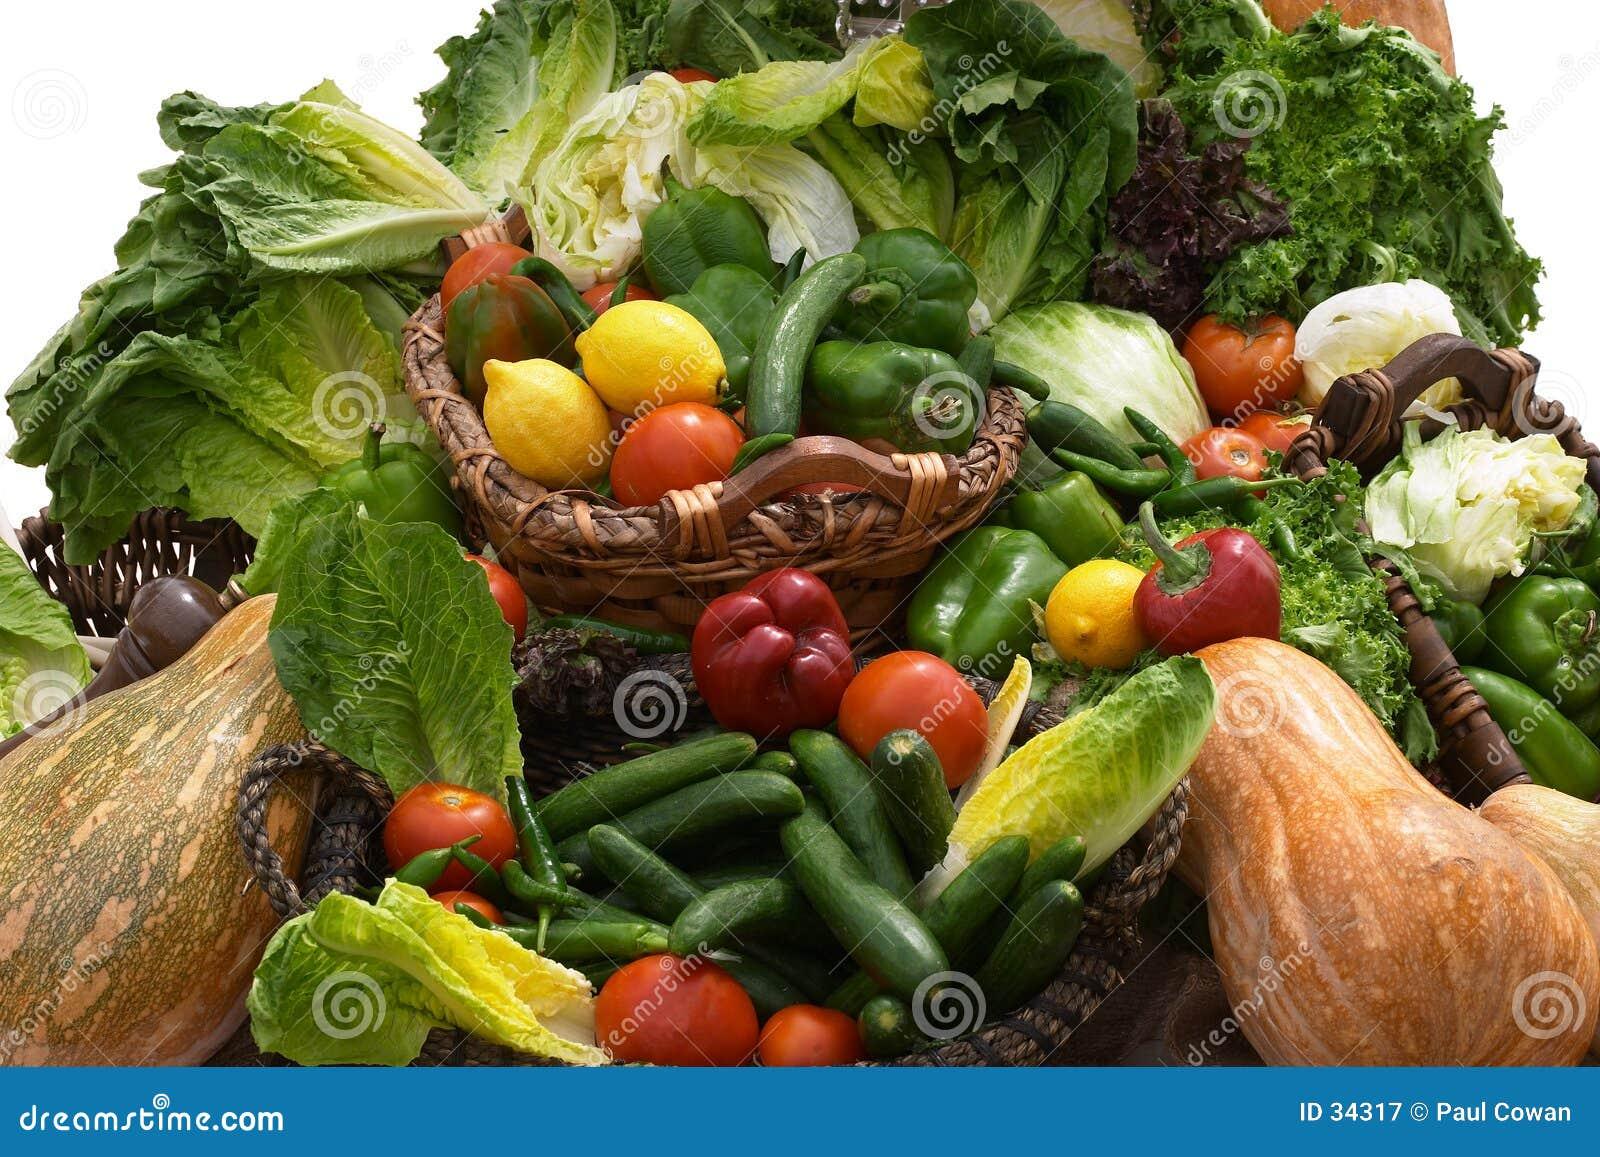 Salad days 2